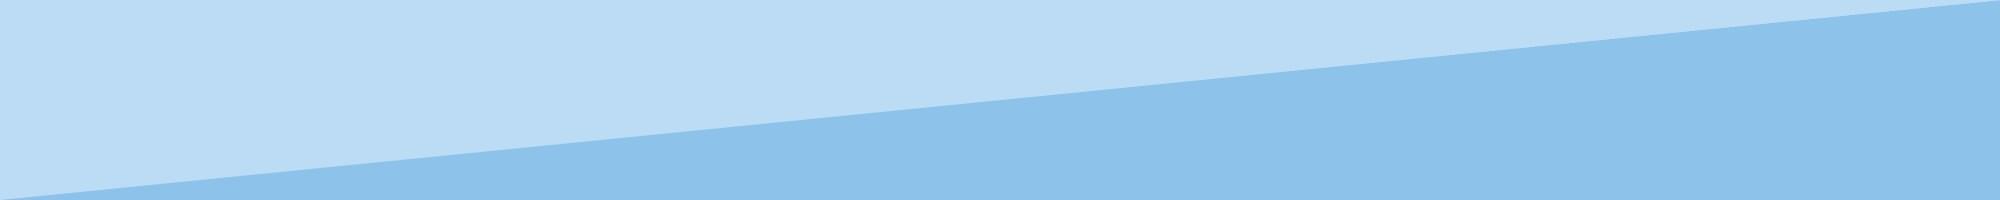 Blue to blue background image